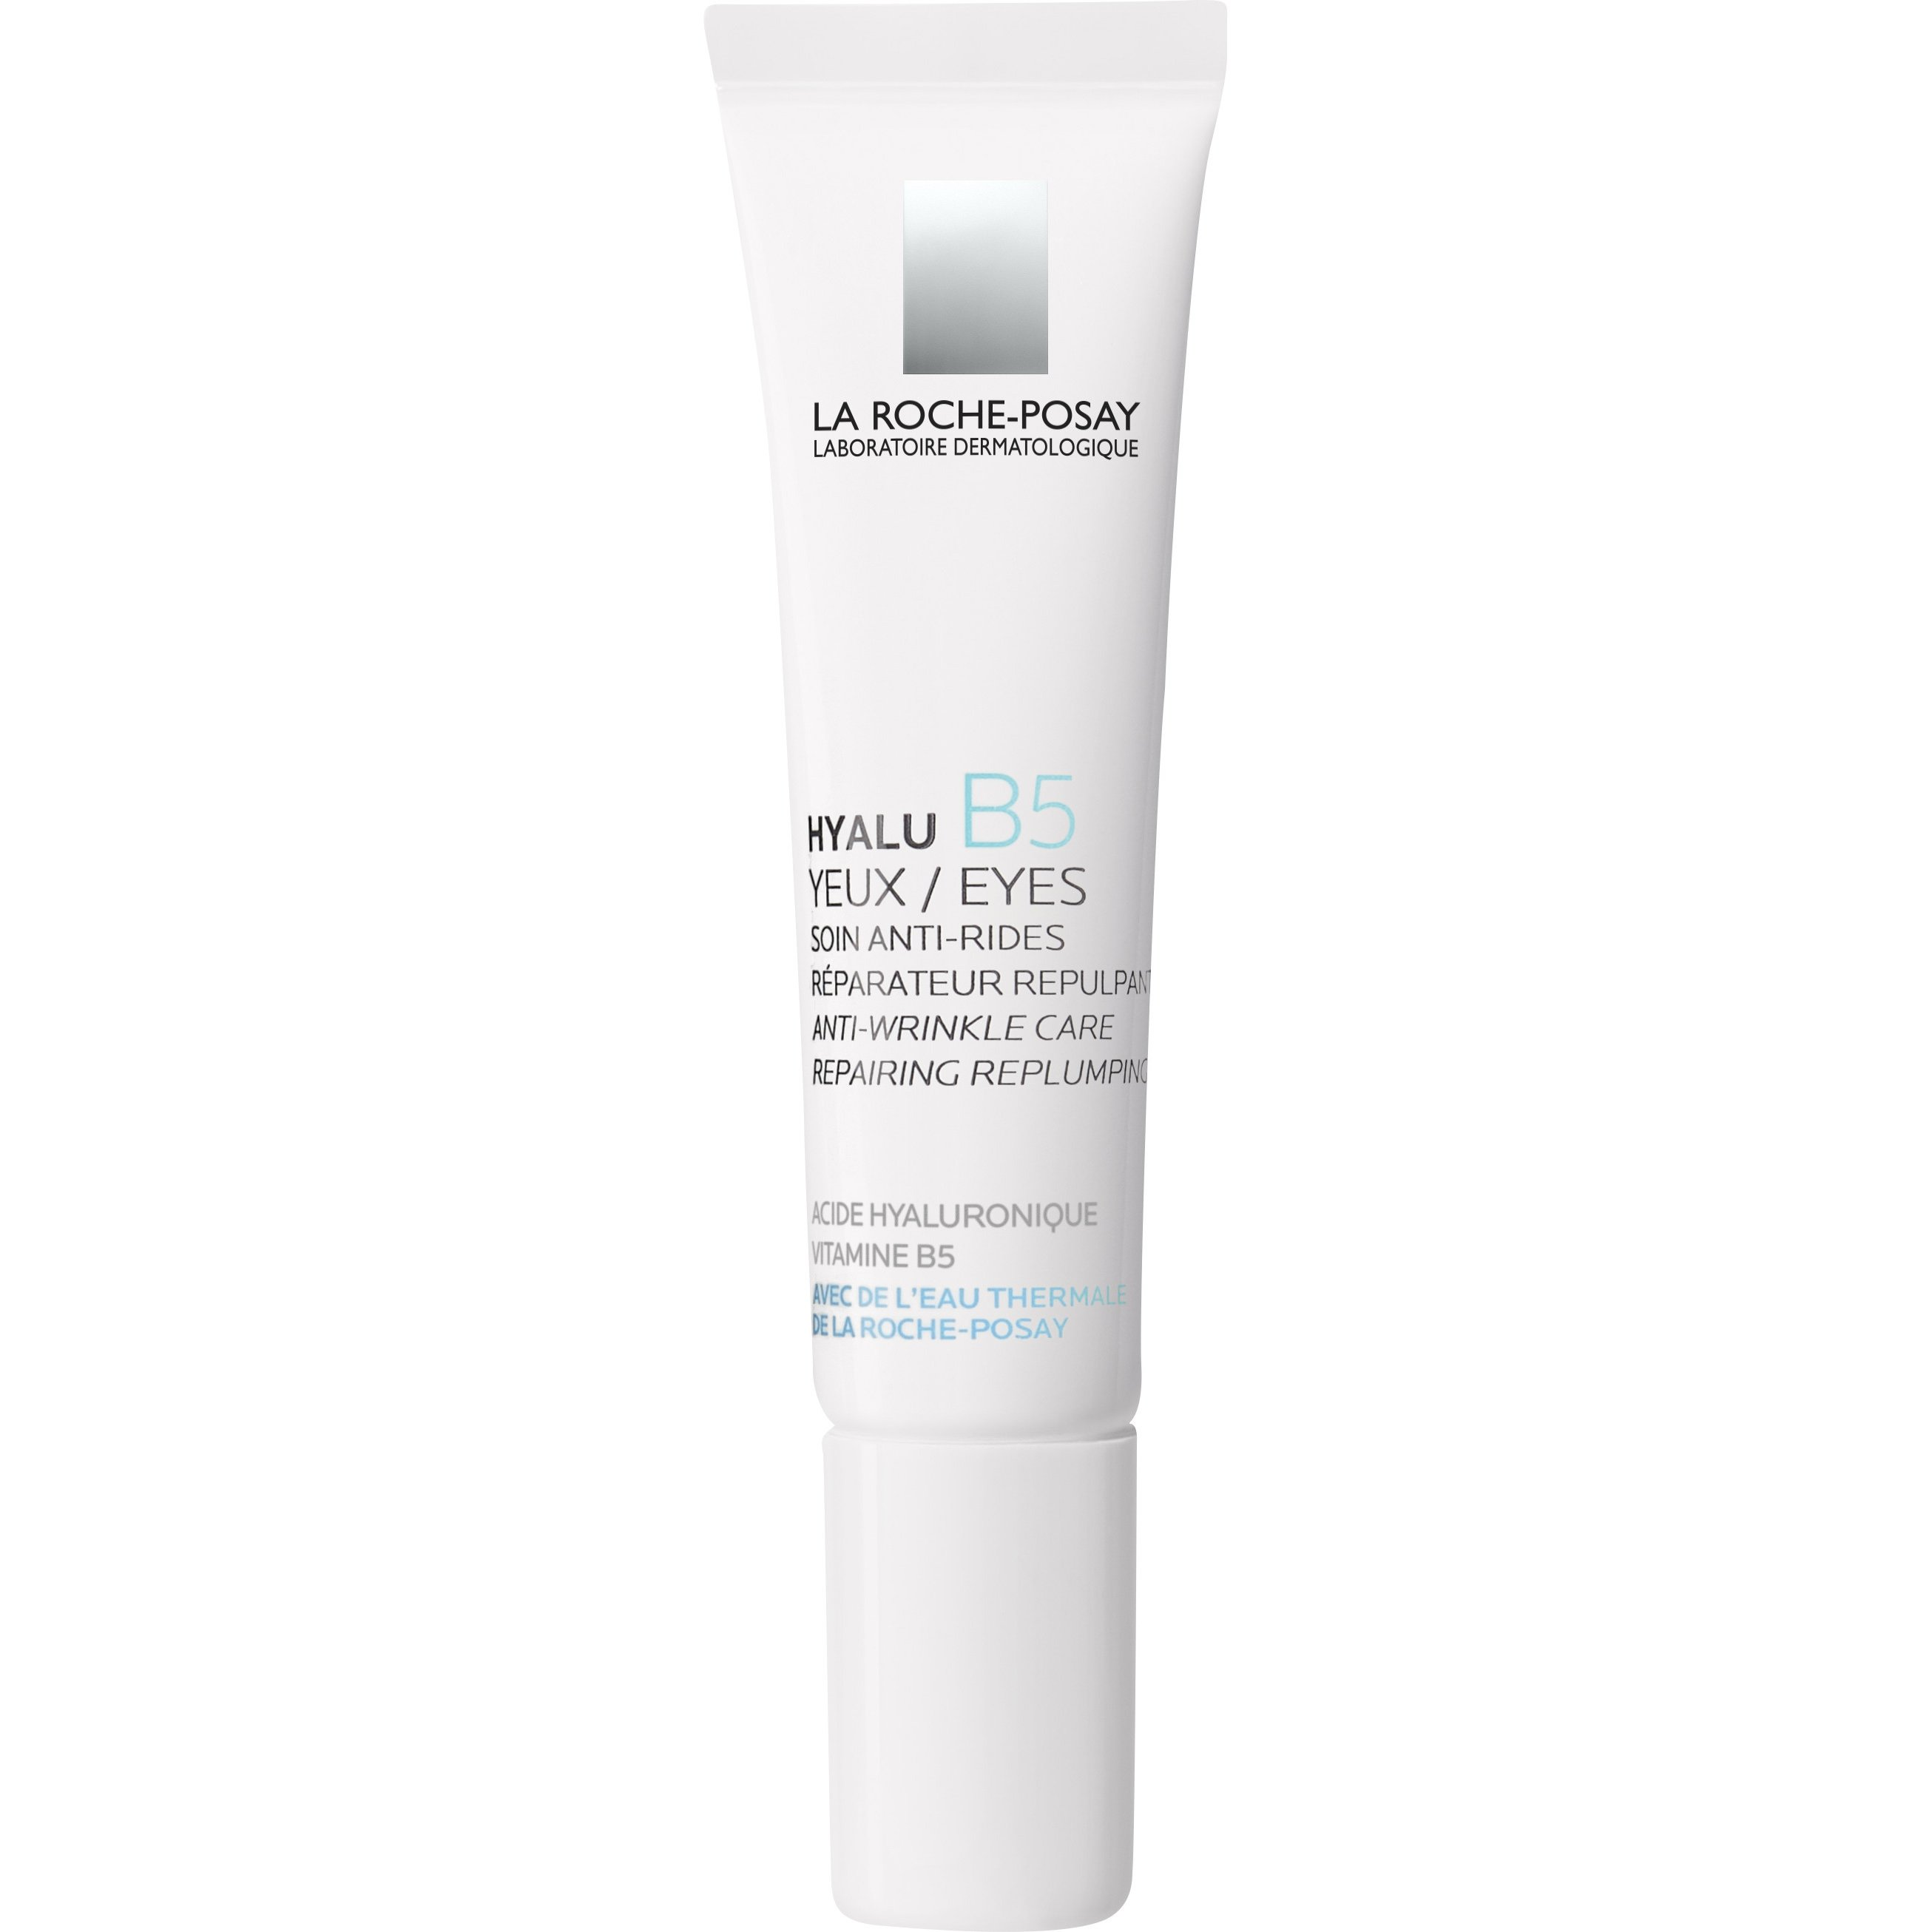 La Roche-Posay Hyalu B5 Anti Wrinkle Eye Cream Αντιρυτιδική Κρέμα Ματιών 15ml